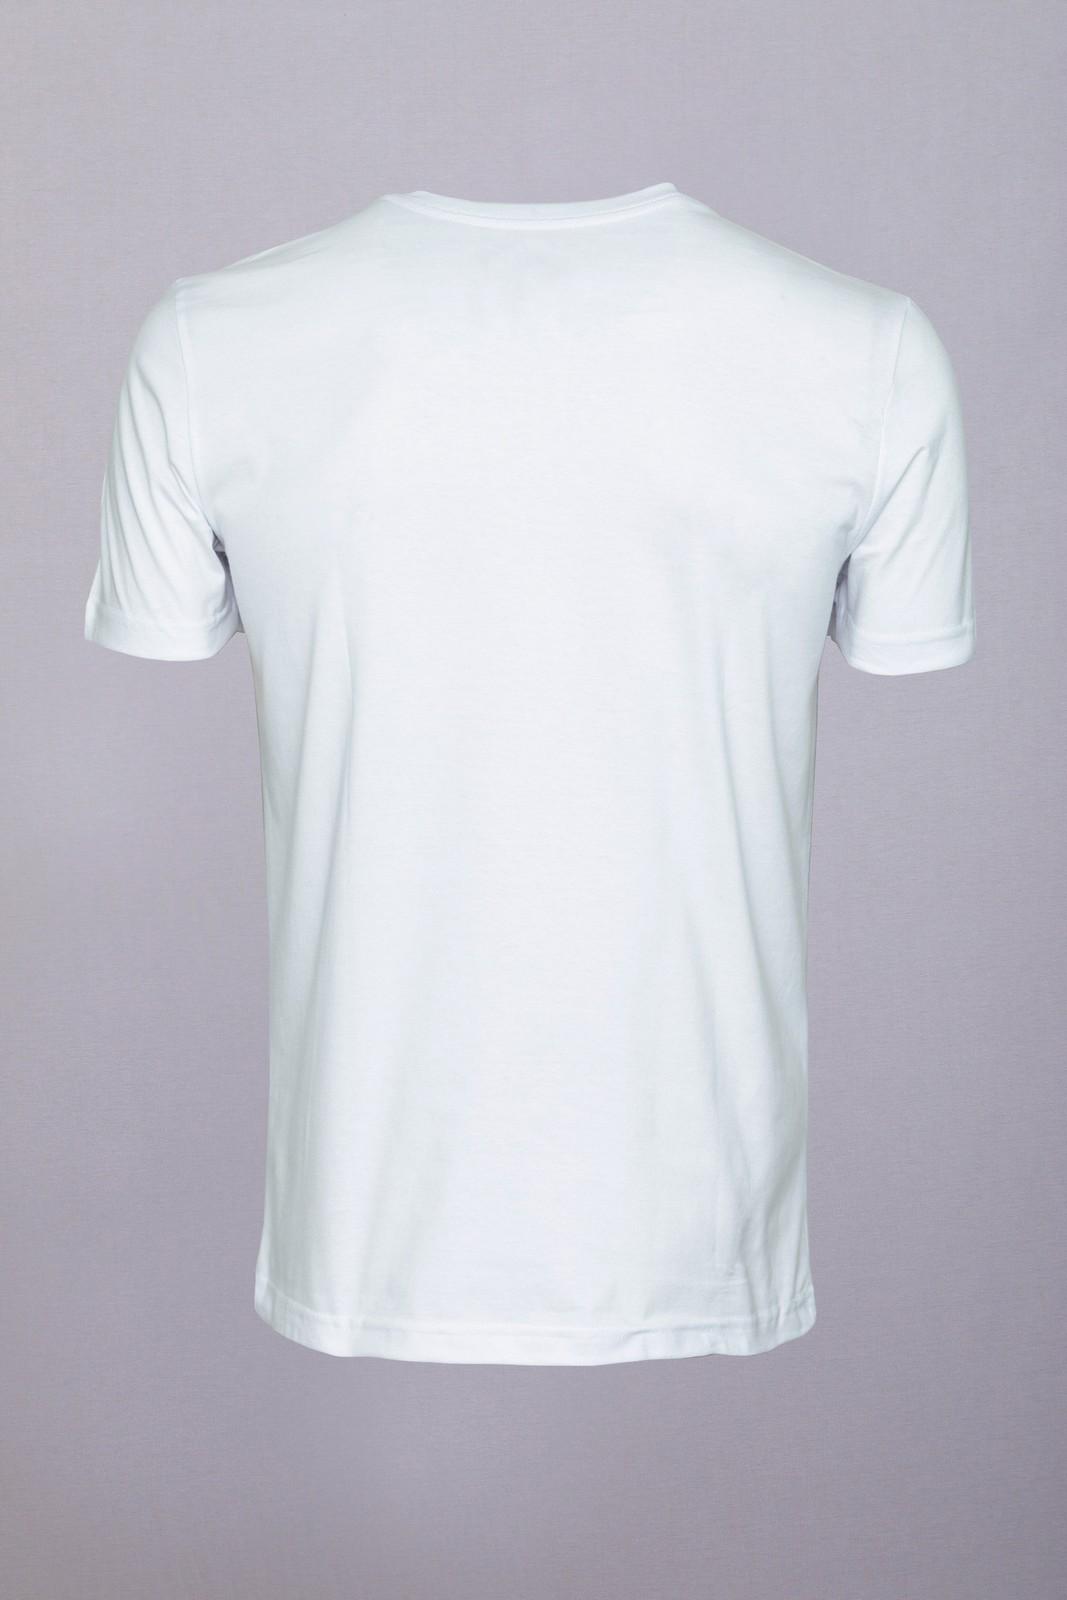 Camiseta Barrocco Free Yourself Branca